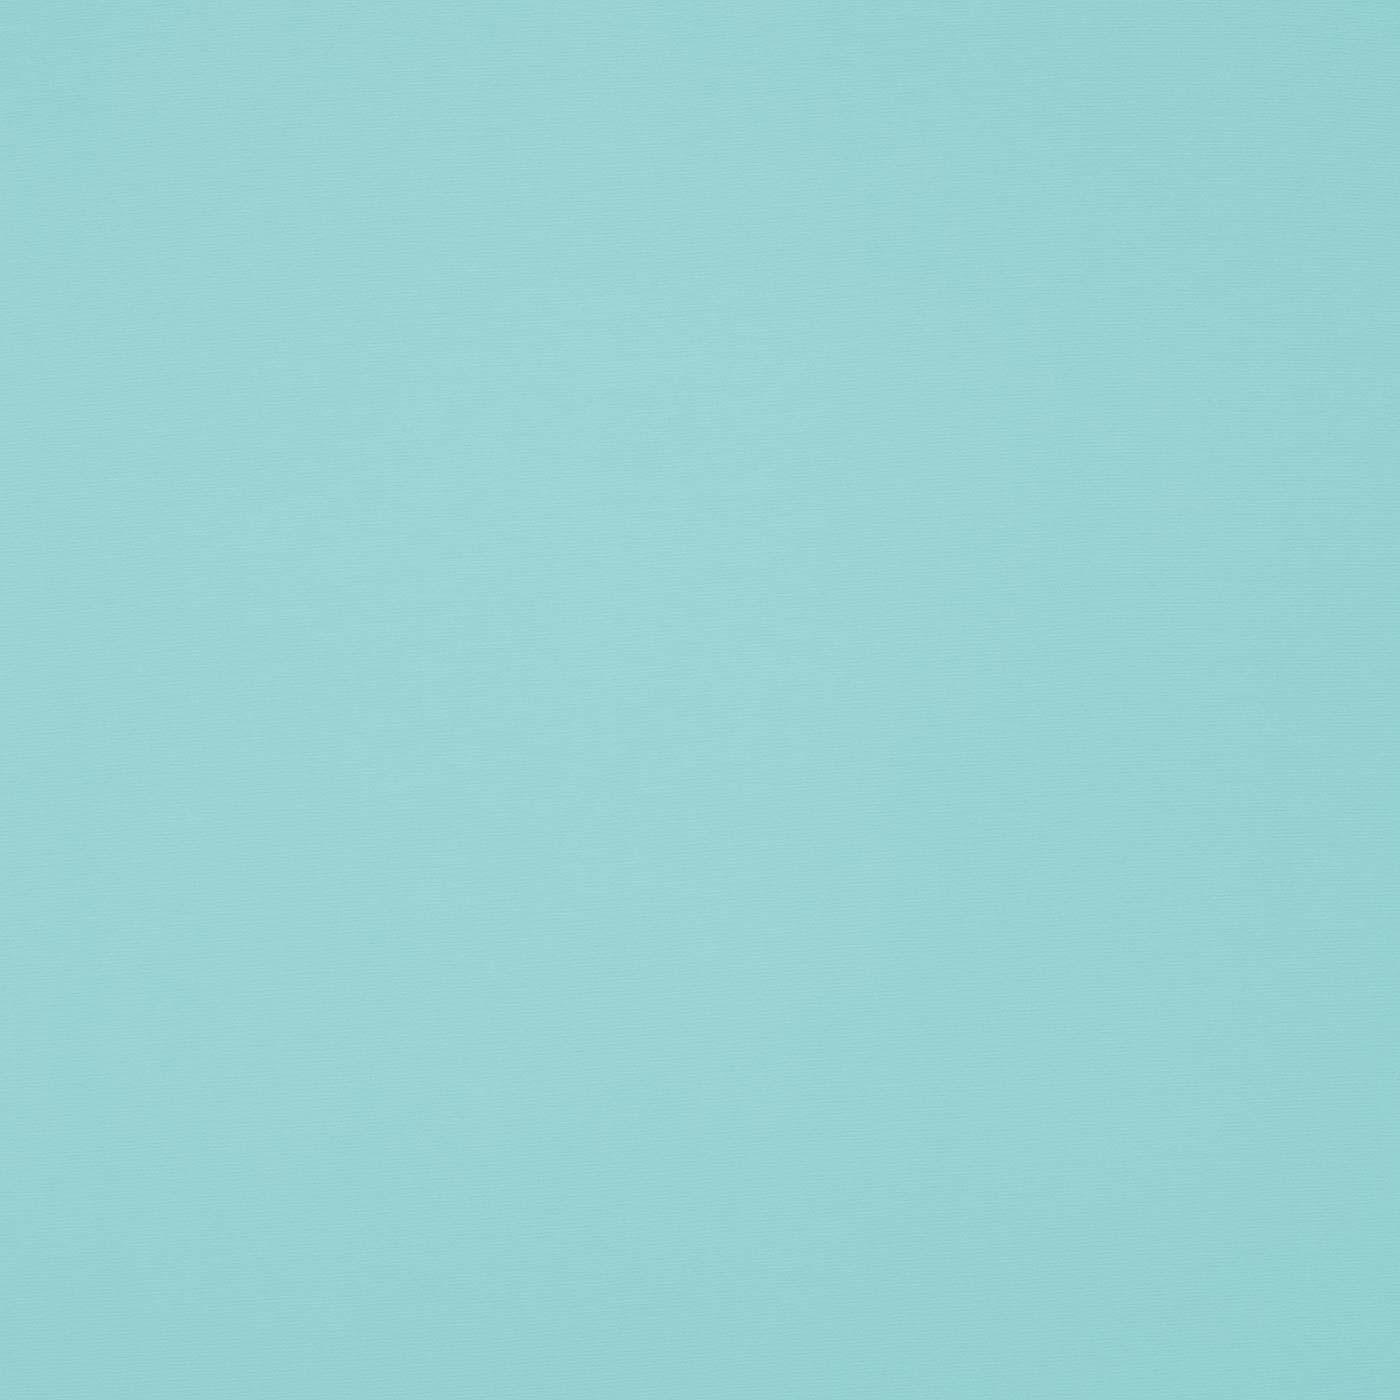 Union Turquoise